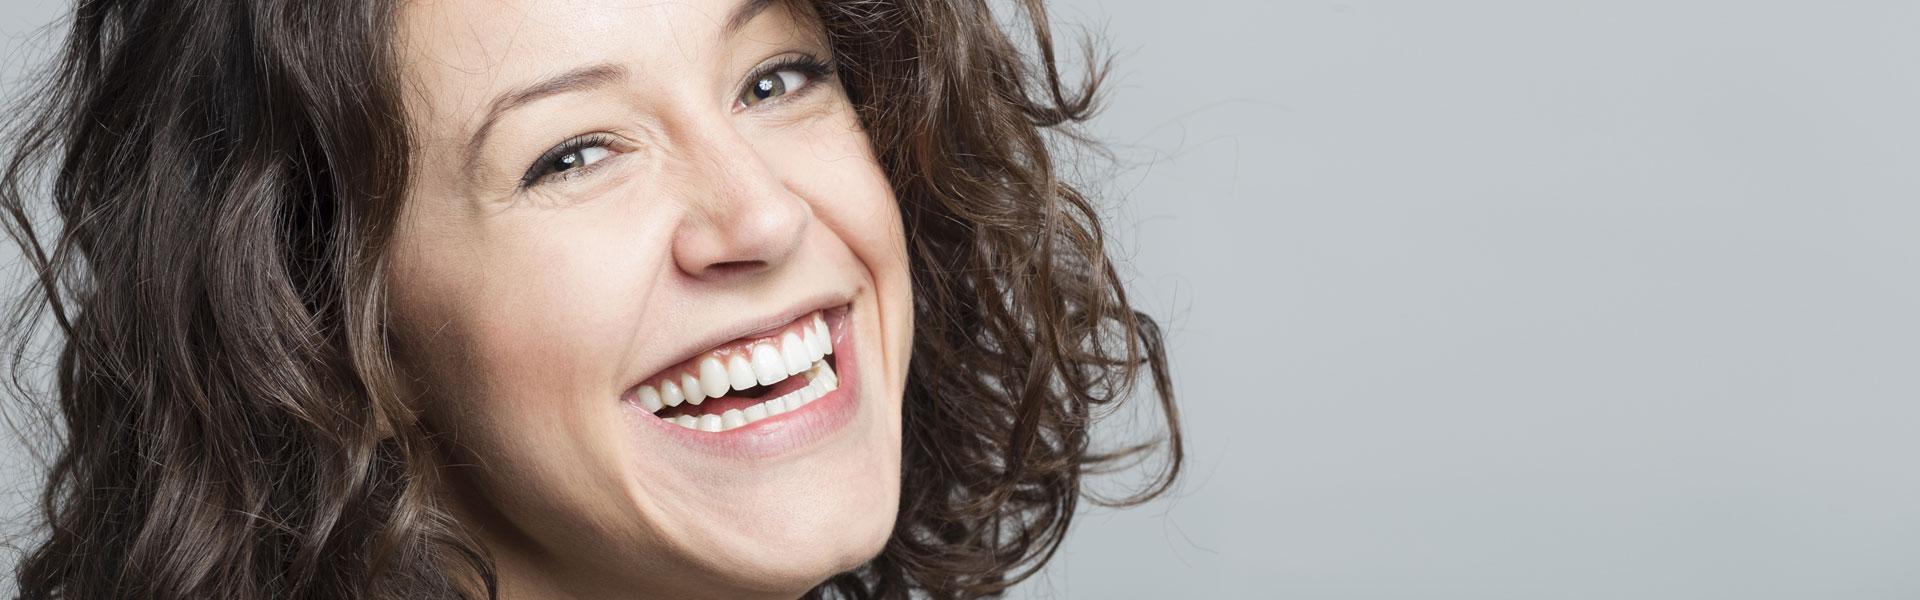 4 Ways Dental Veneers Can Change Your Life